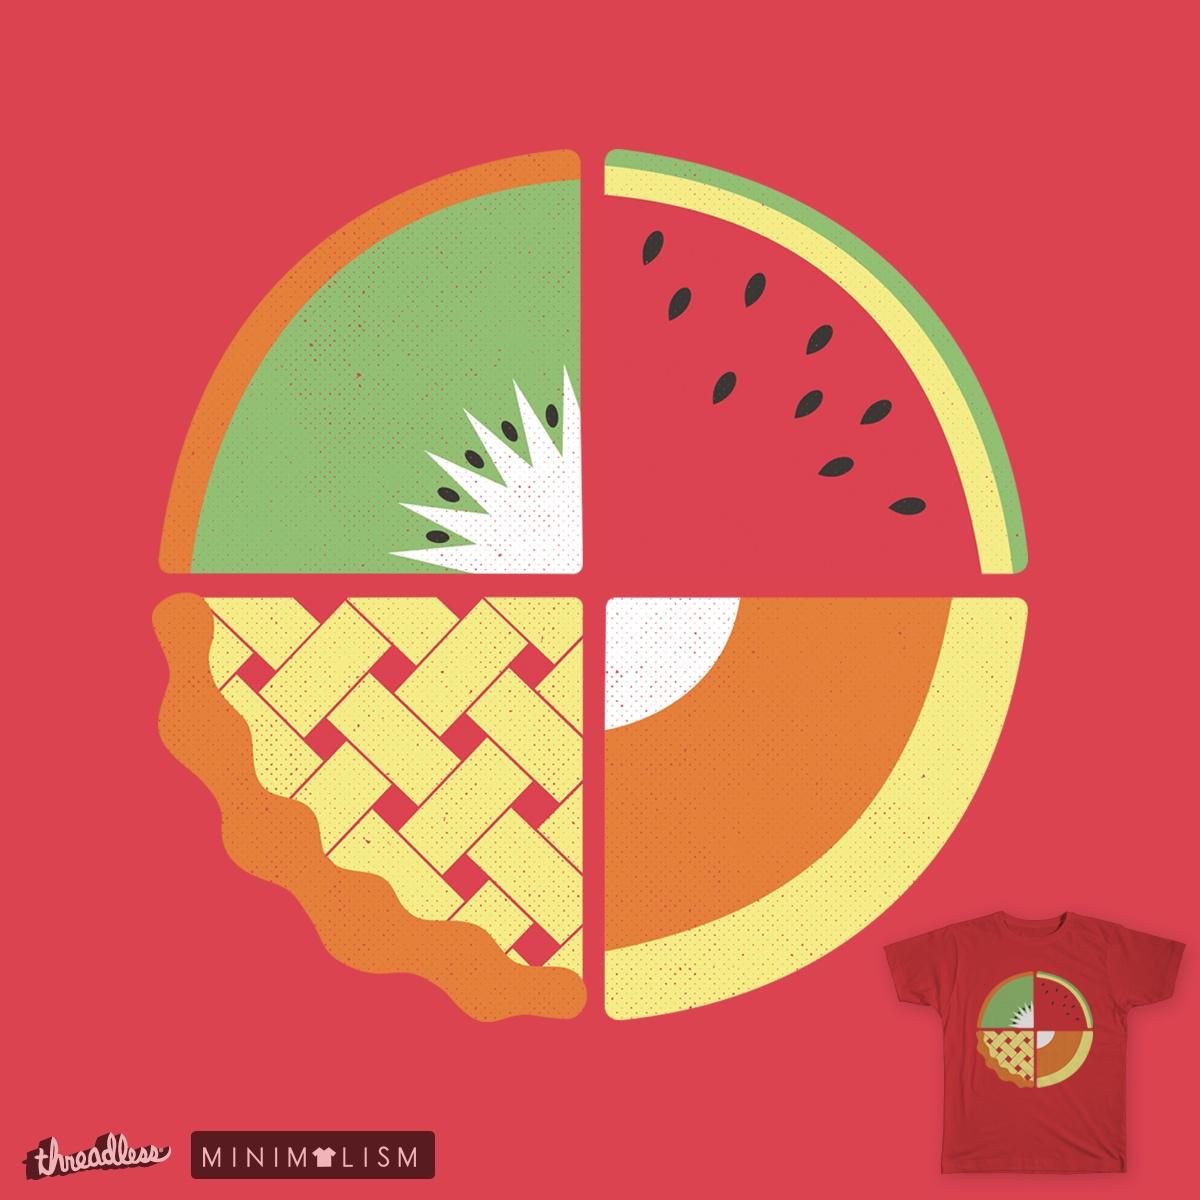 Seasonal Diet by hayzimet on Threadless